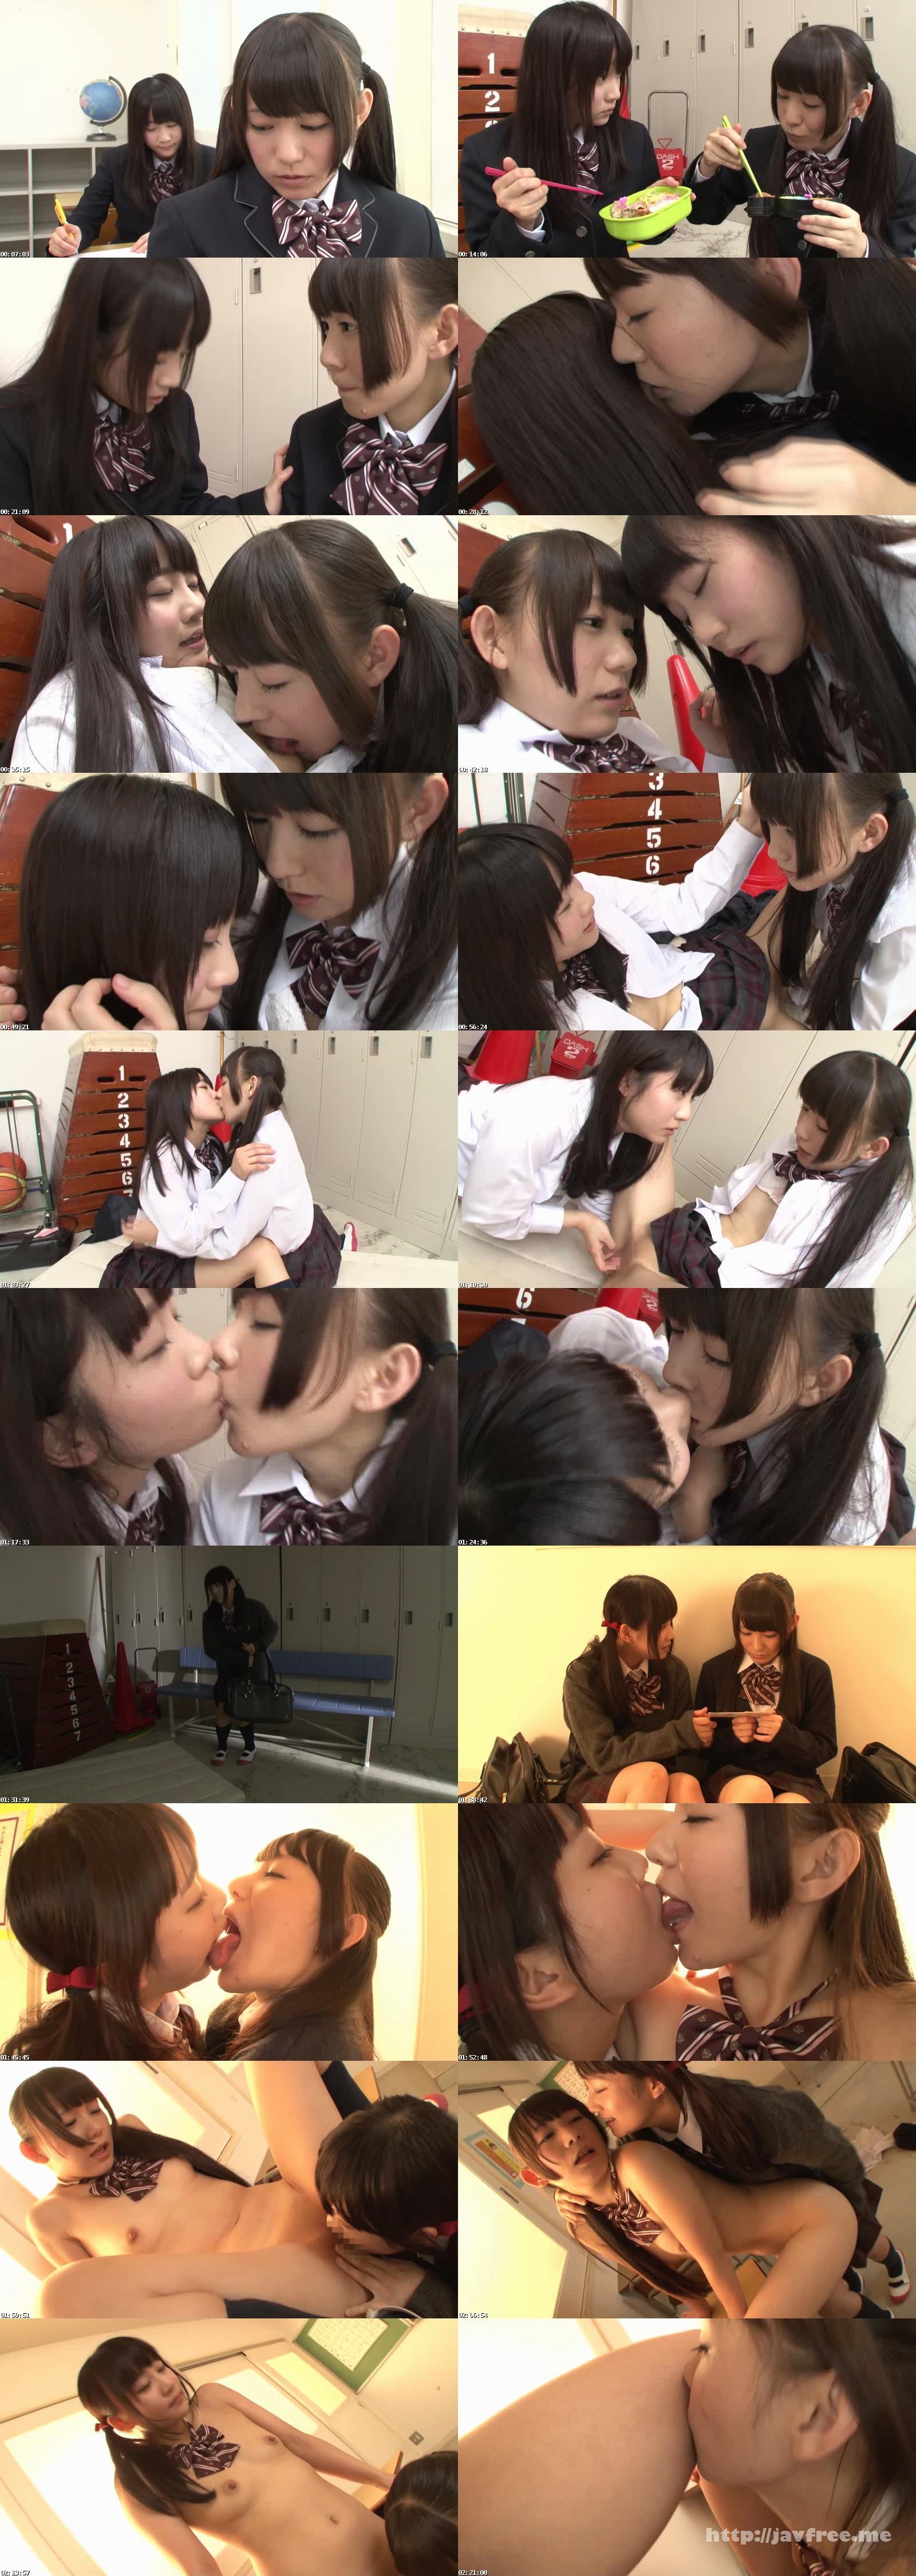 [VRTM 123] 恋文 〜第二章 密愛・百合女子校生 篠宮ゆり 小西まりえ 篠宮ゆり 小西まりえ VRTM